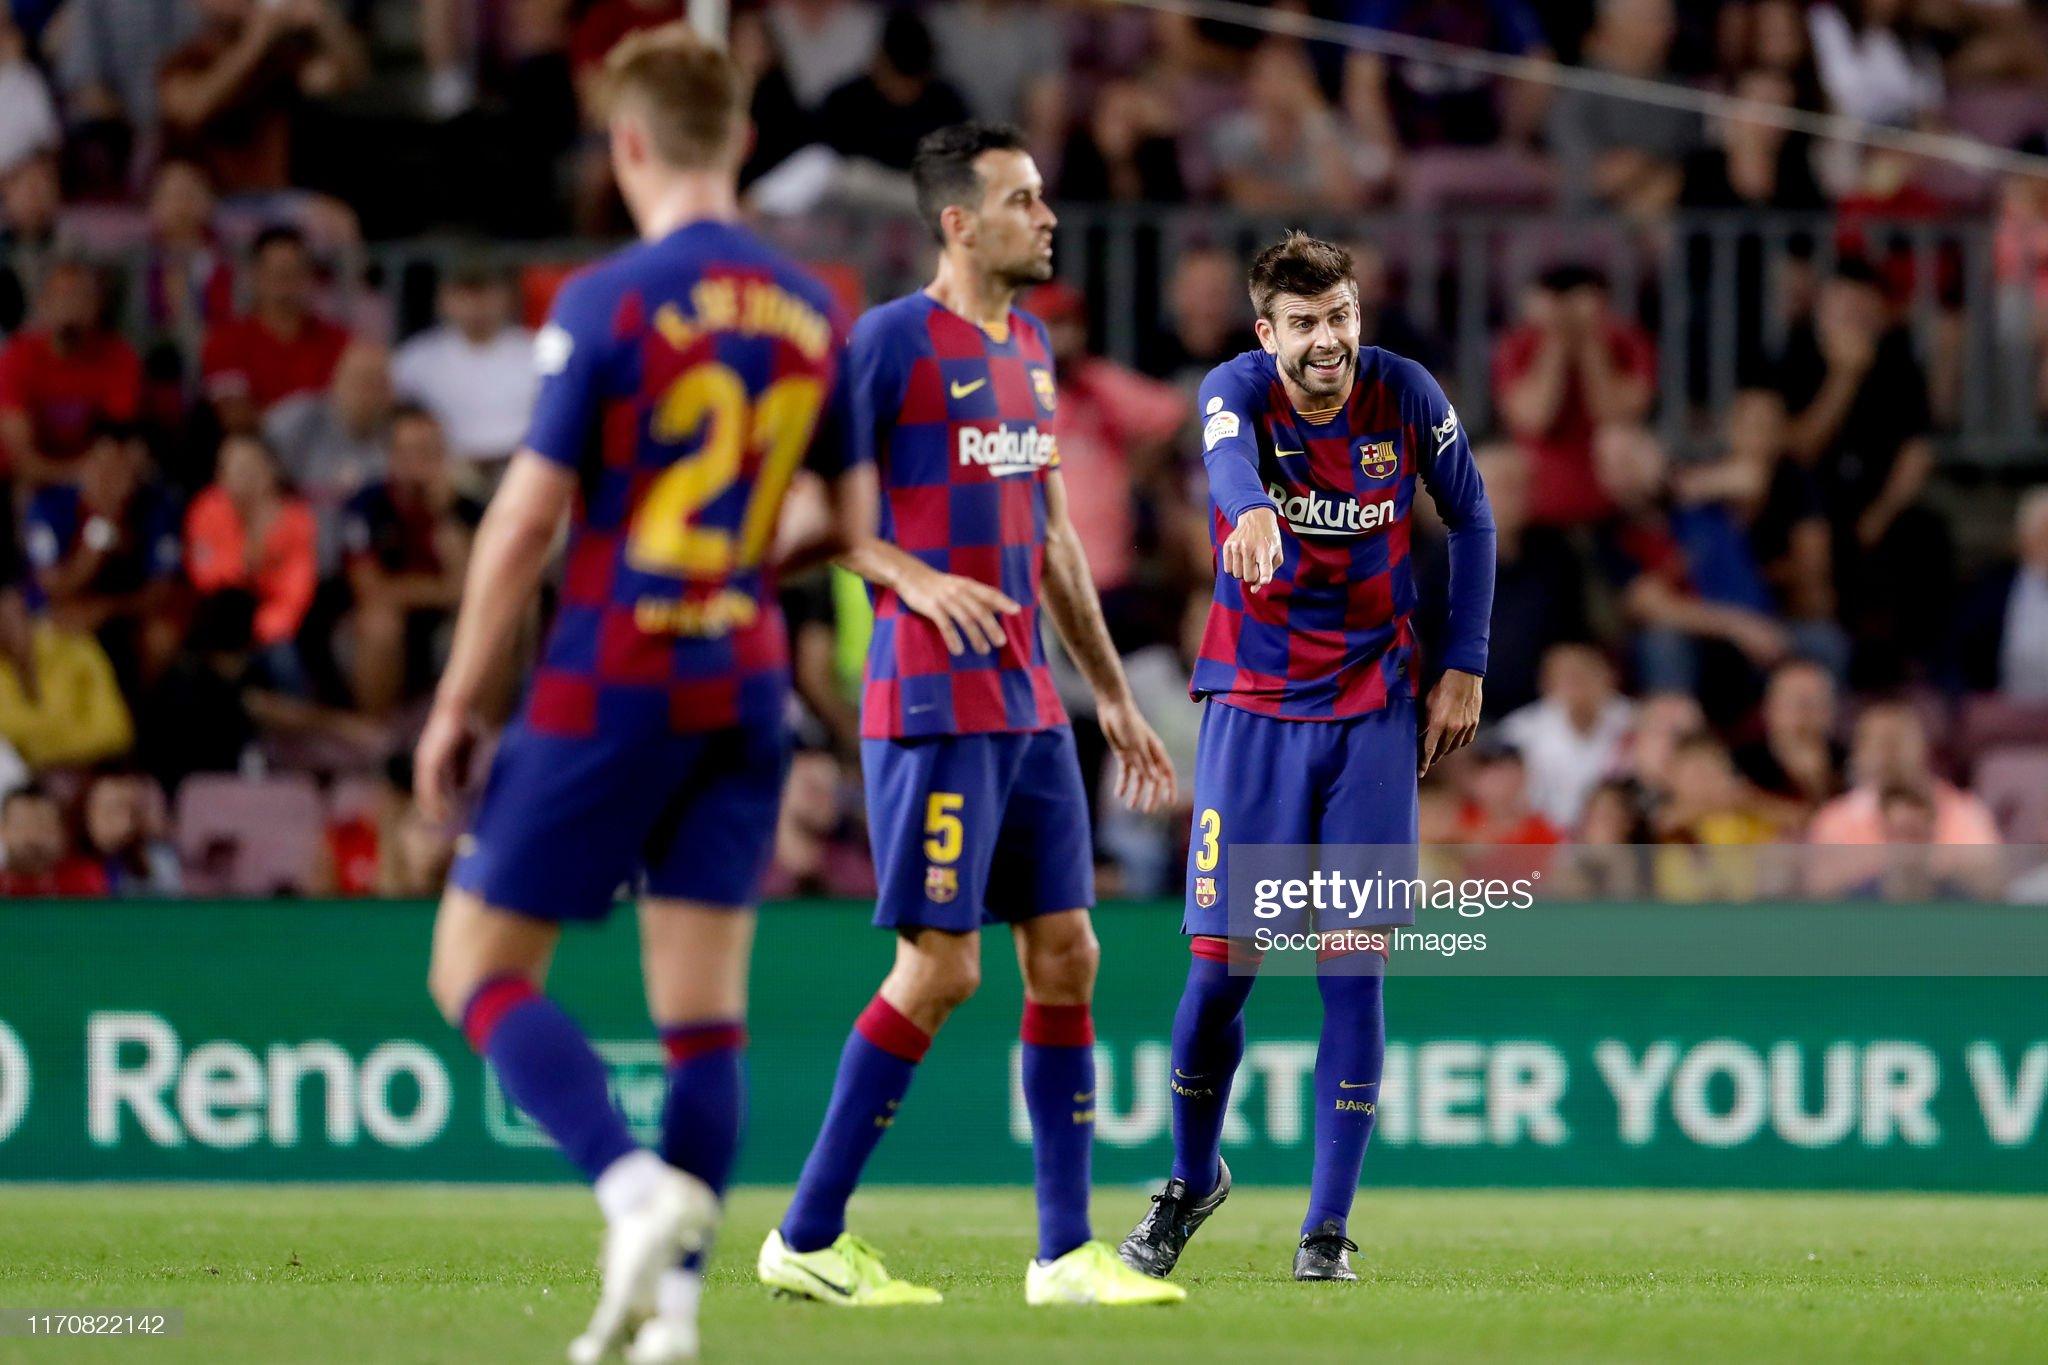 صور مباراة : برشلونة - فياريال 2-1 ( 24-09-2019 )  Gerard-pique-of-fc-barcelona-during-the-la-liga-santander-match-fc-picture-id1170822142?s=2048x2048